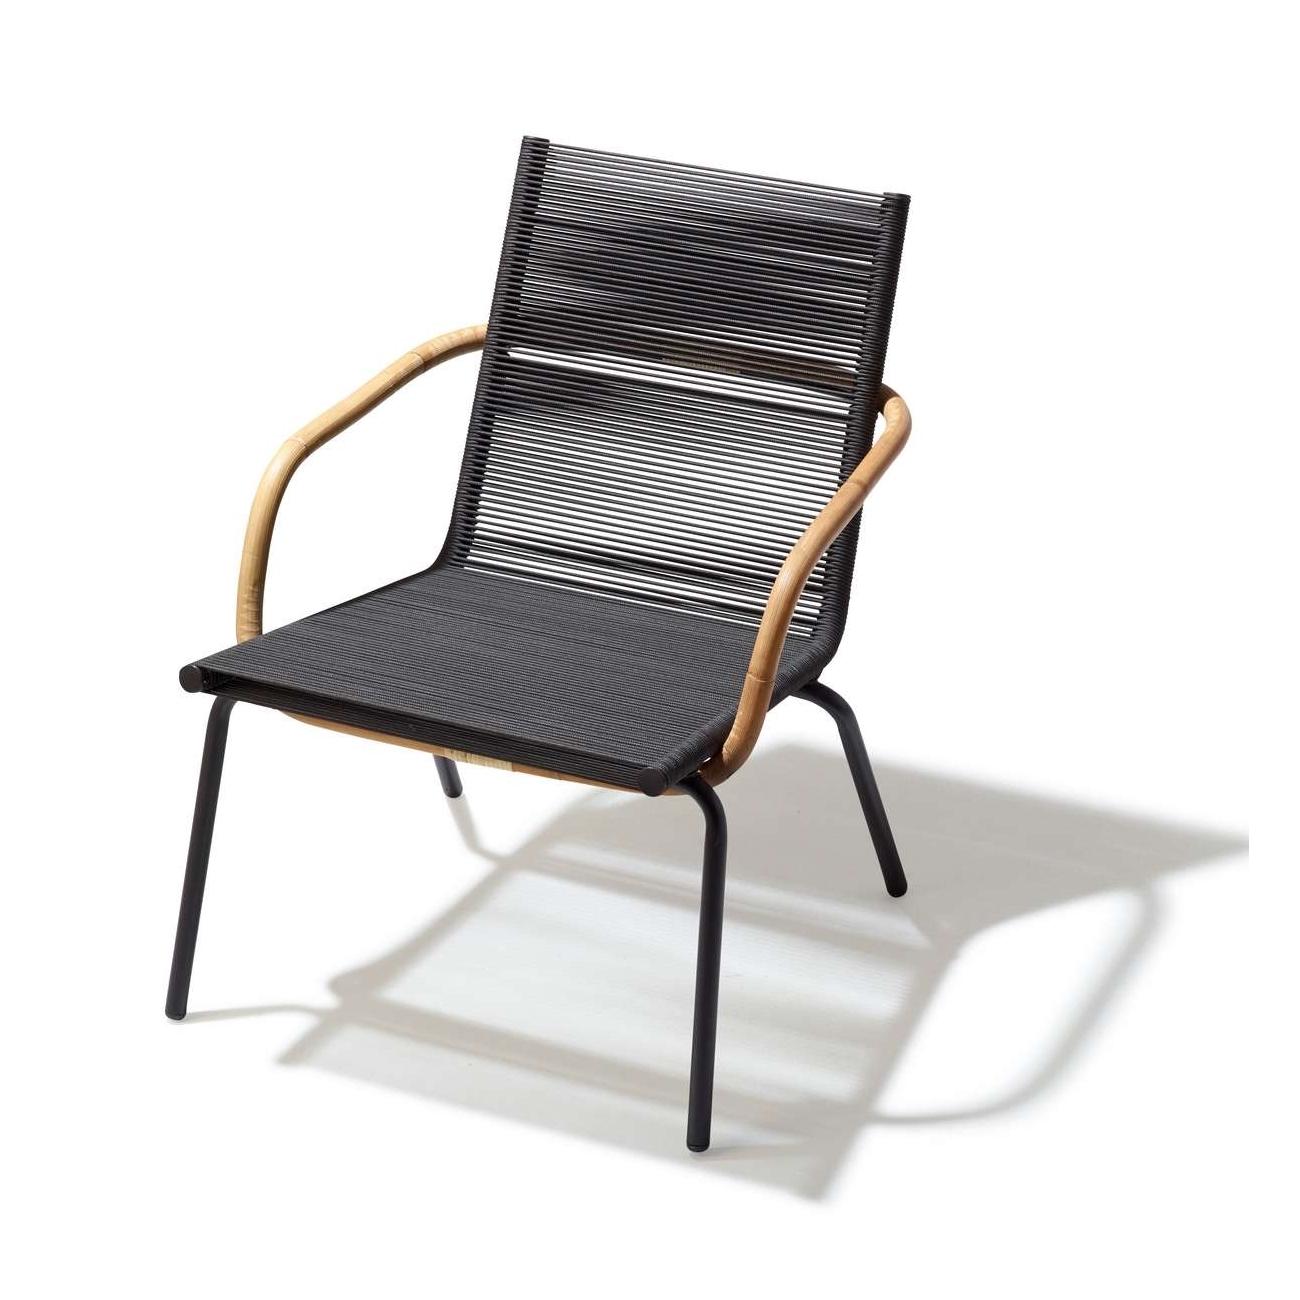 SIDD loungestol med armstöd brun, Cane-line